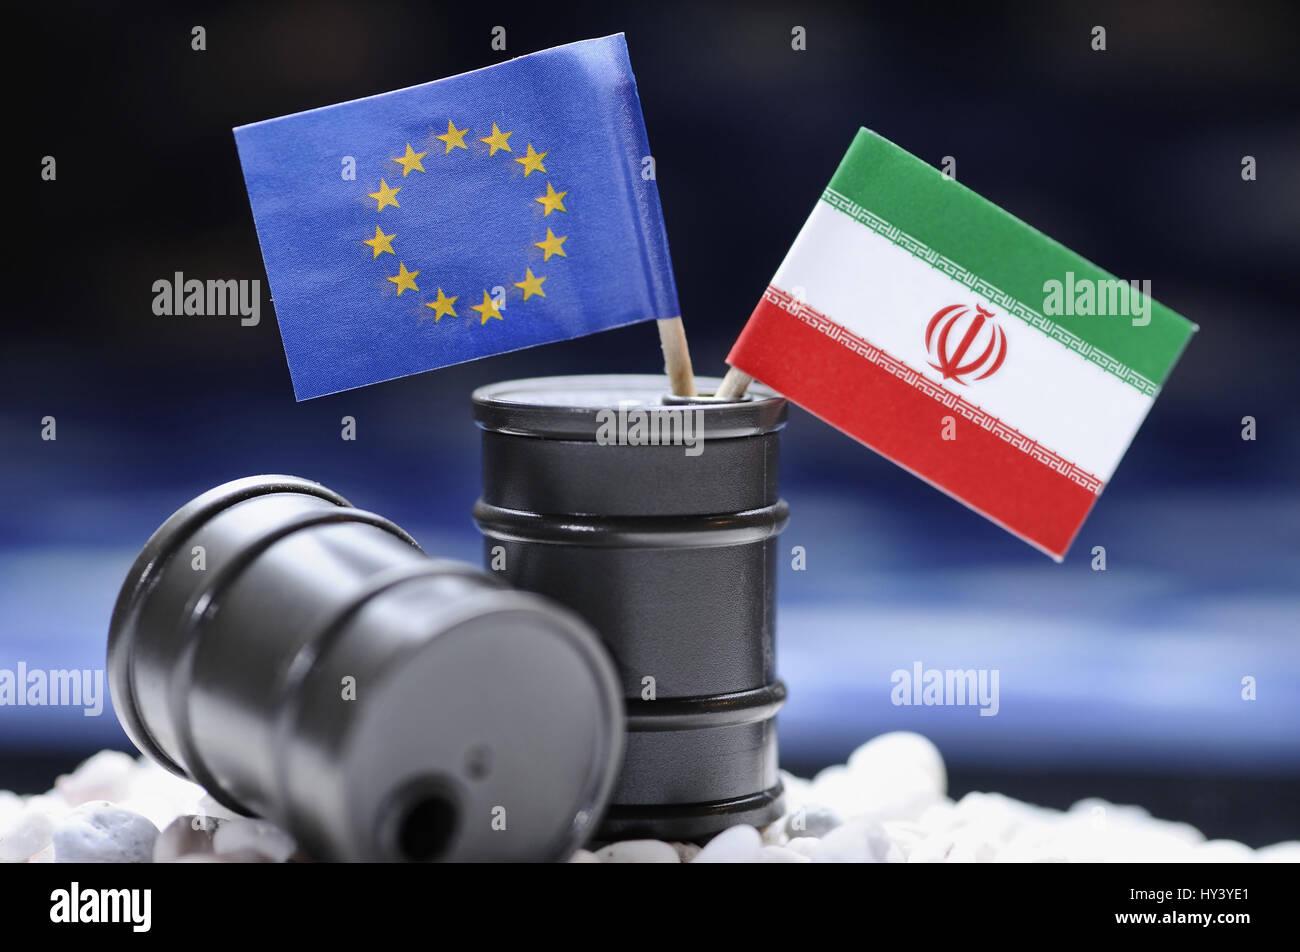 EU and Iran flag in oil barrels, symbolic photo oil embargo of the EU against Iran, EU- und Iran-Fahne in oelfaessern, Stock Photo